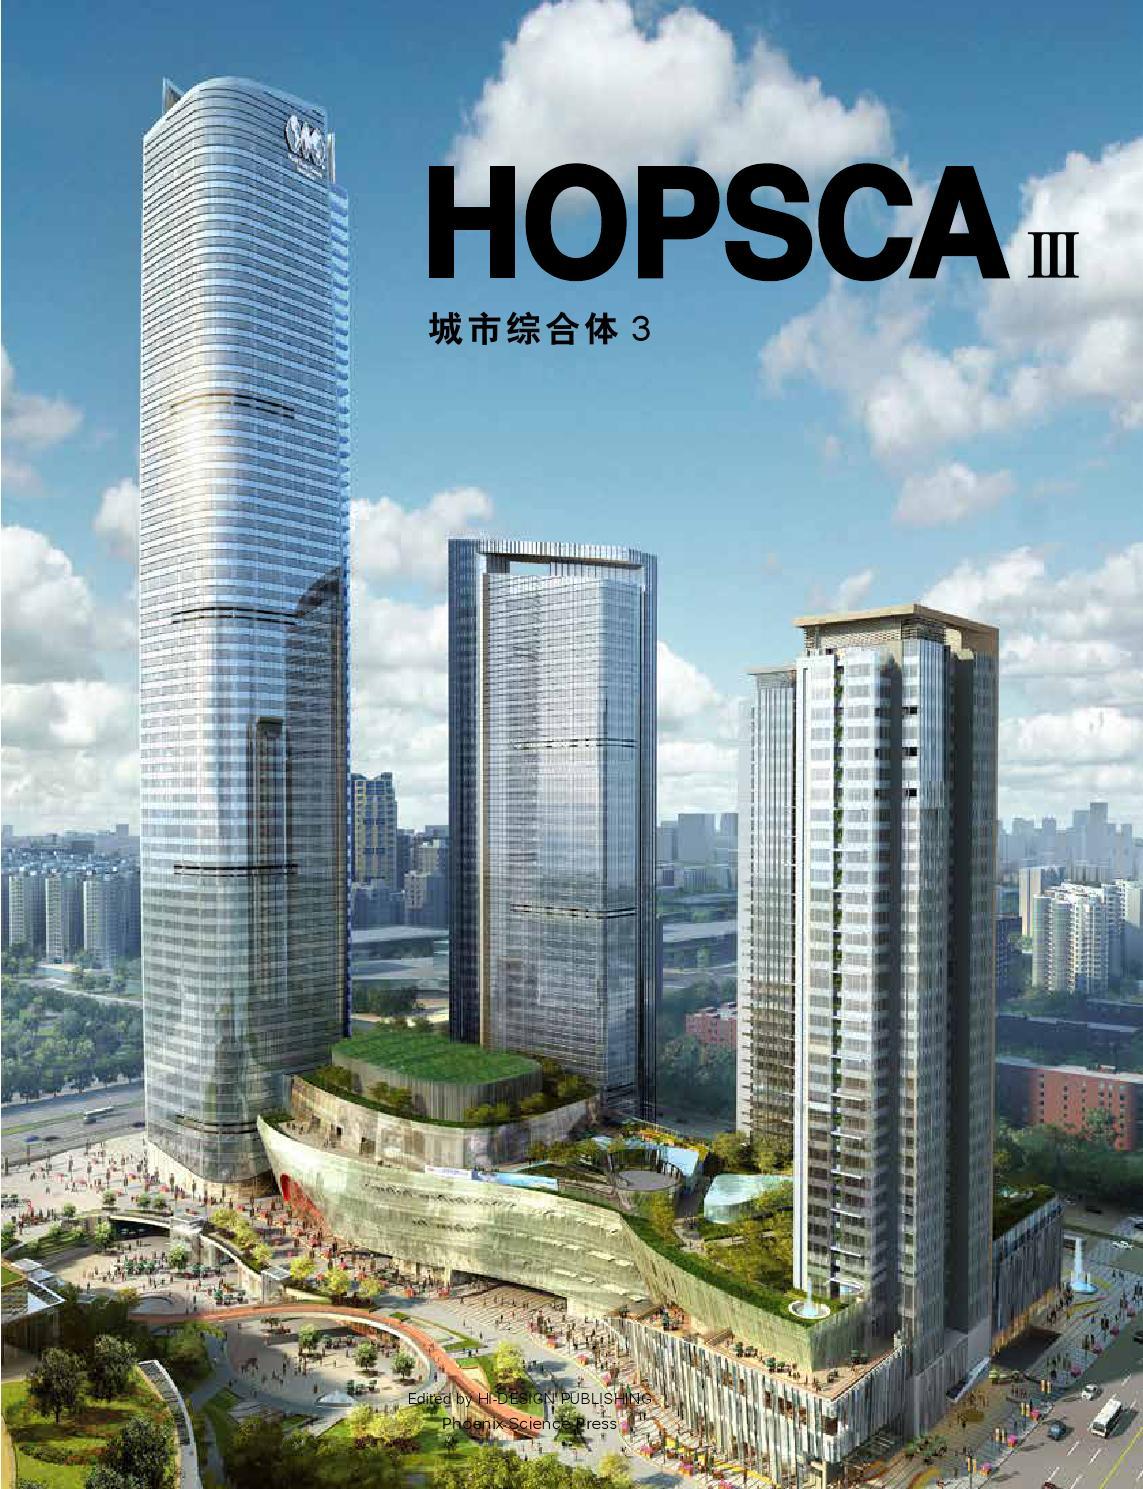 HOPSCA III By HI DESIGN INTERNATIONAL PUBLISHING HK CO